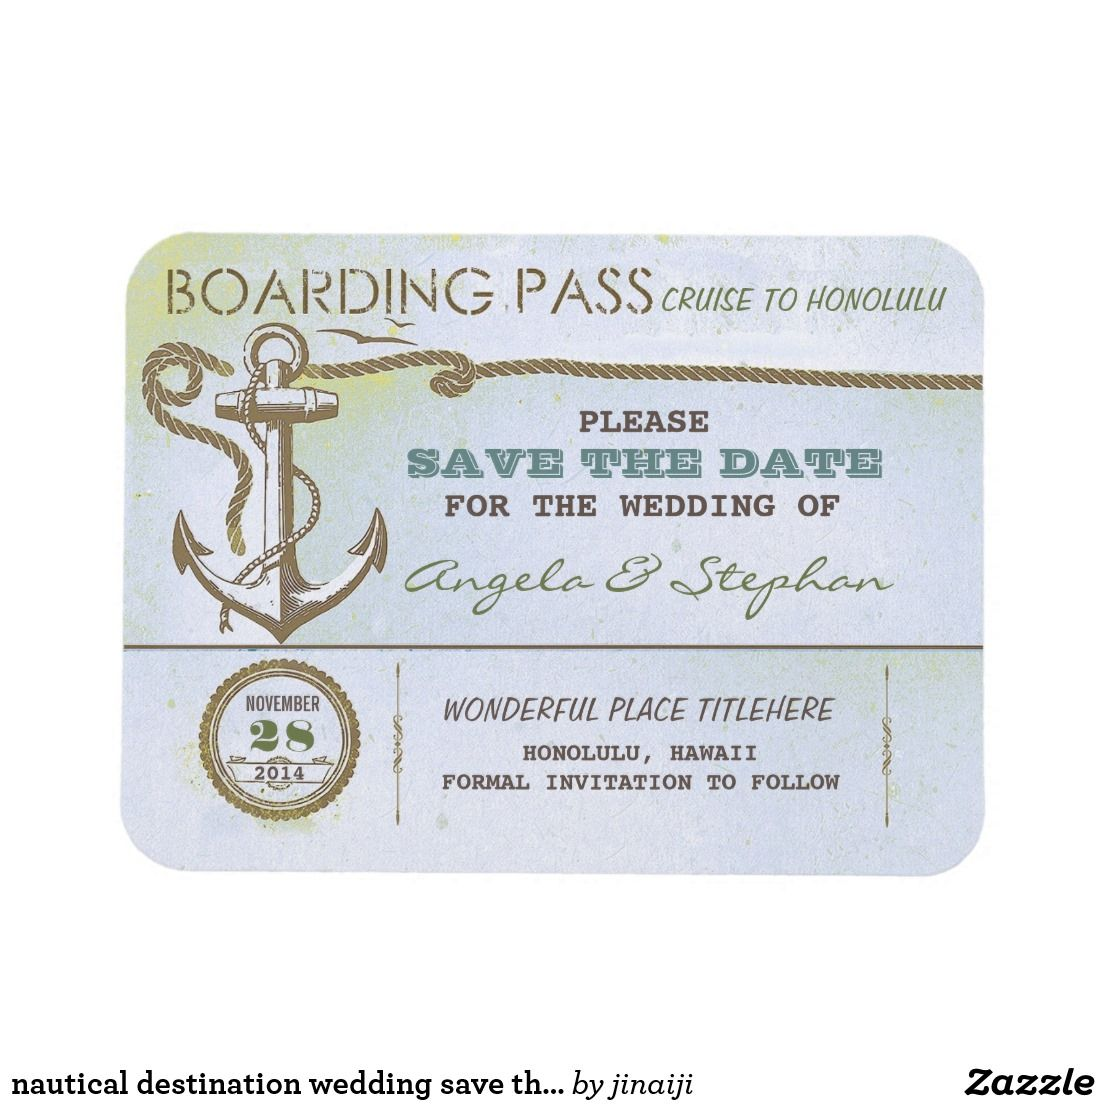 nautical destination wedding save the date Zazzle